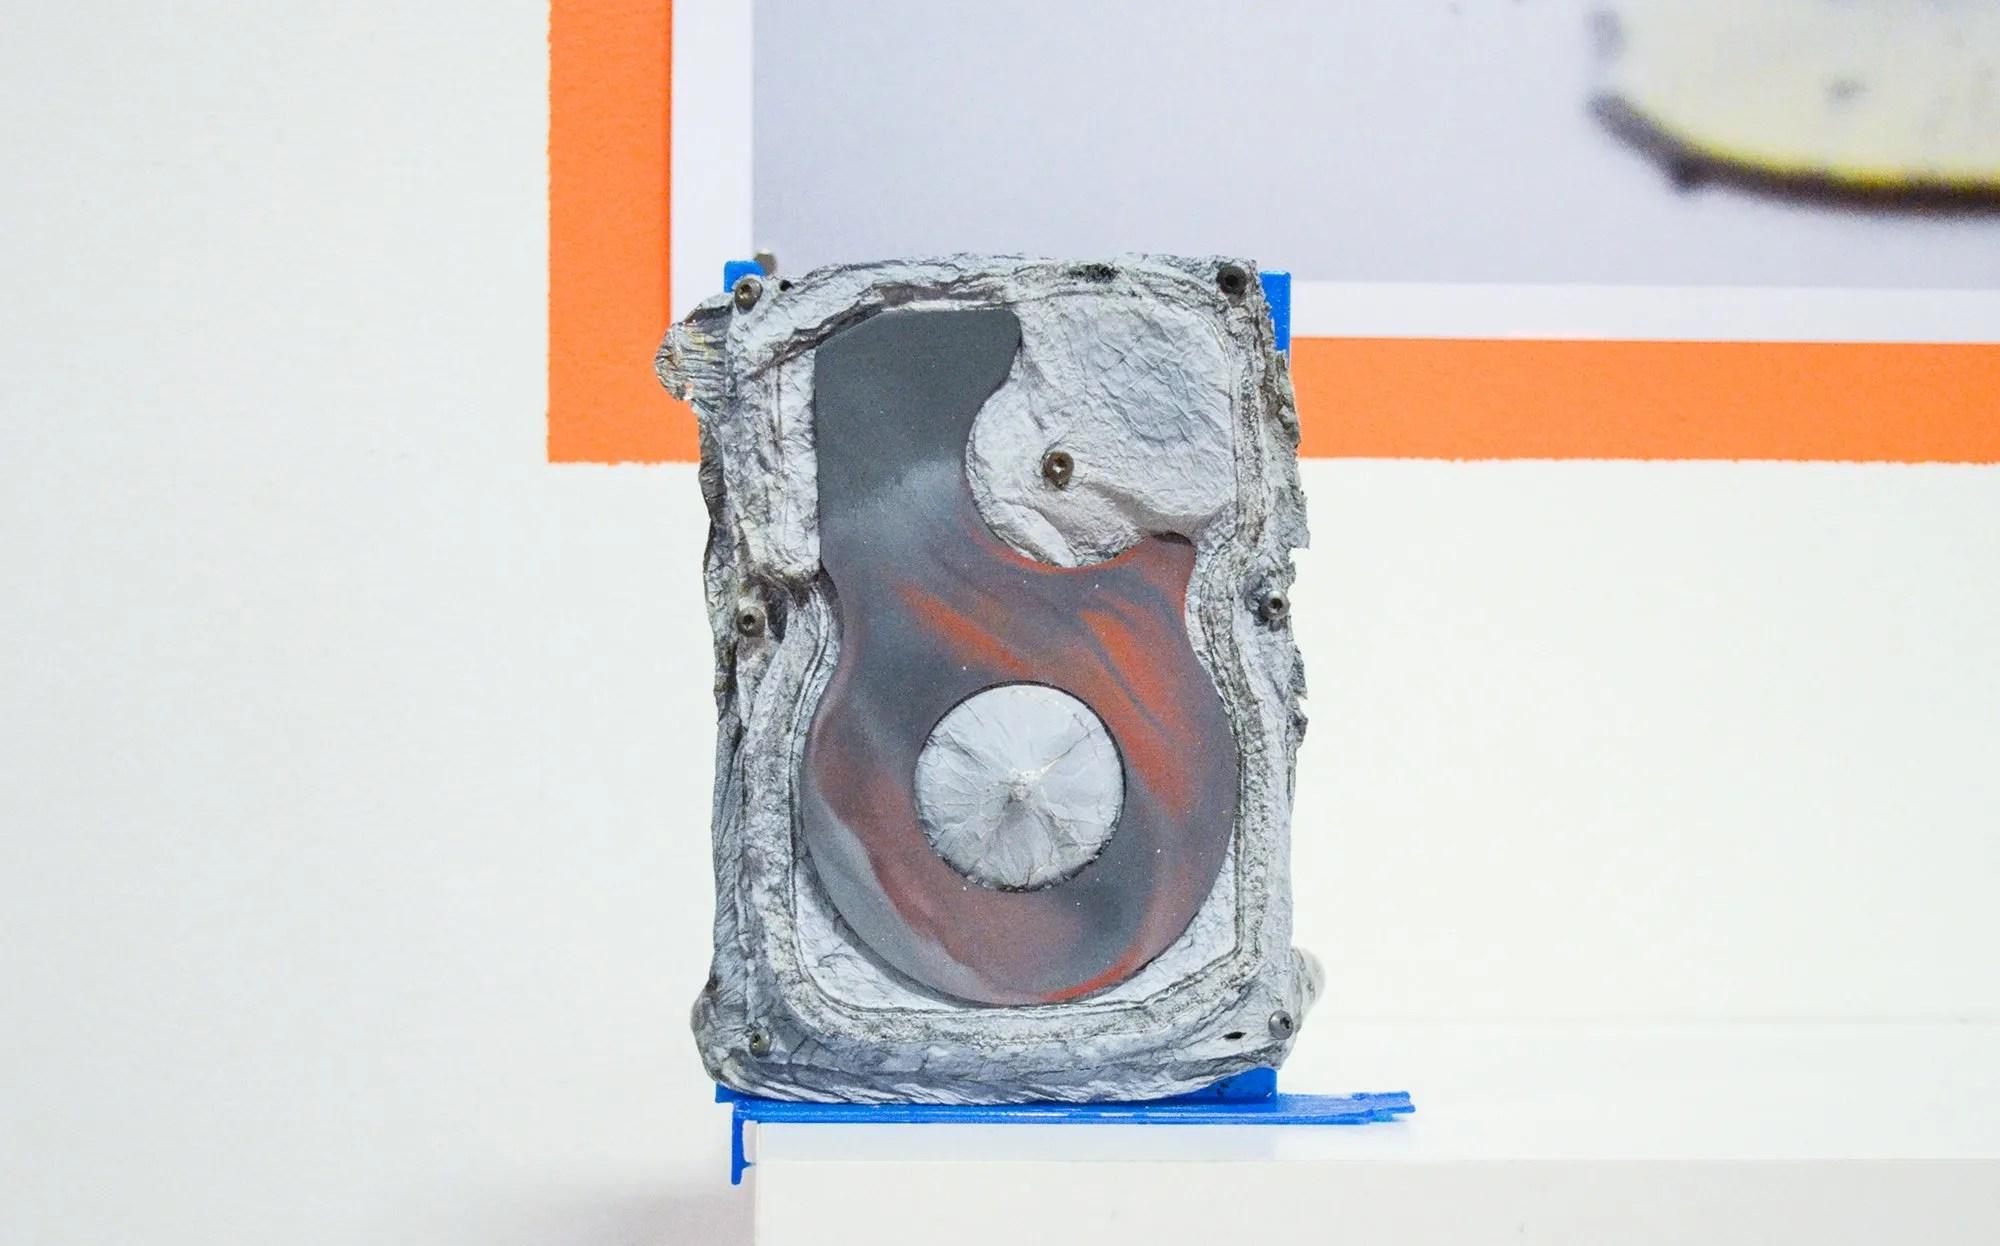 harddrive-burn